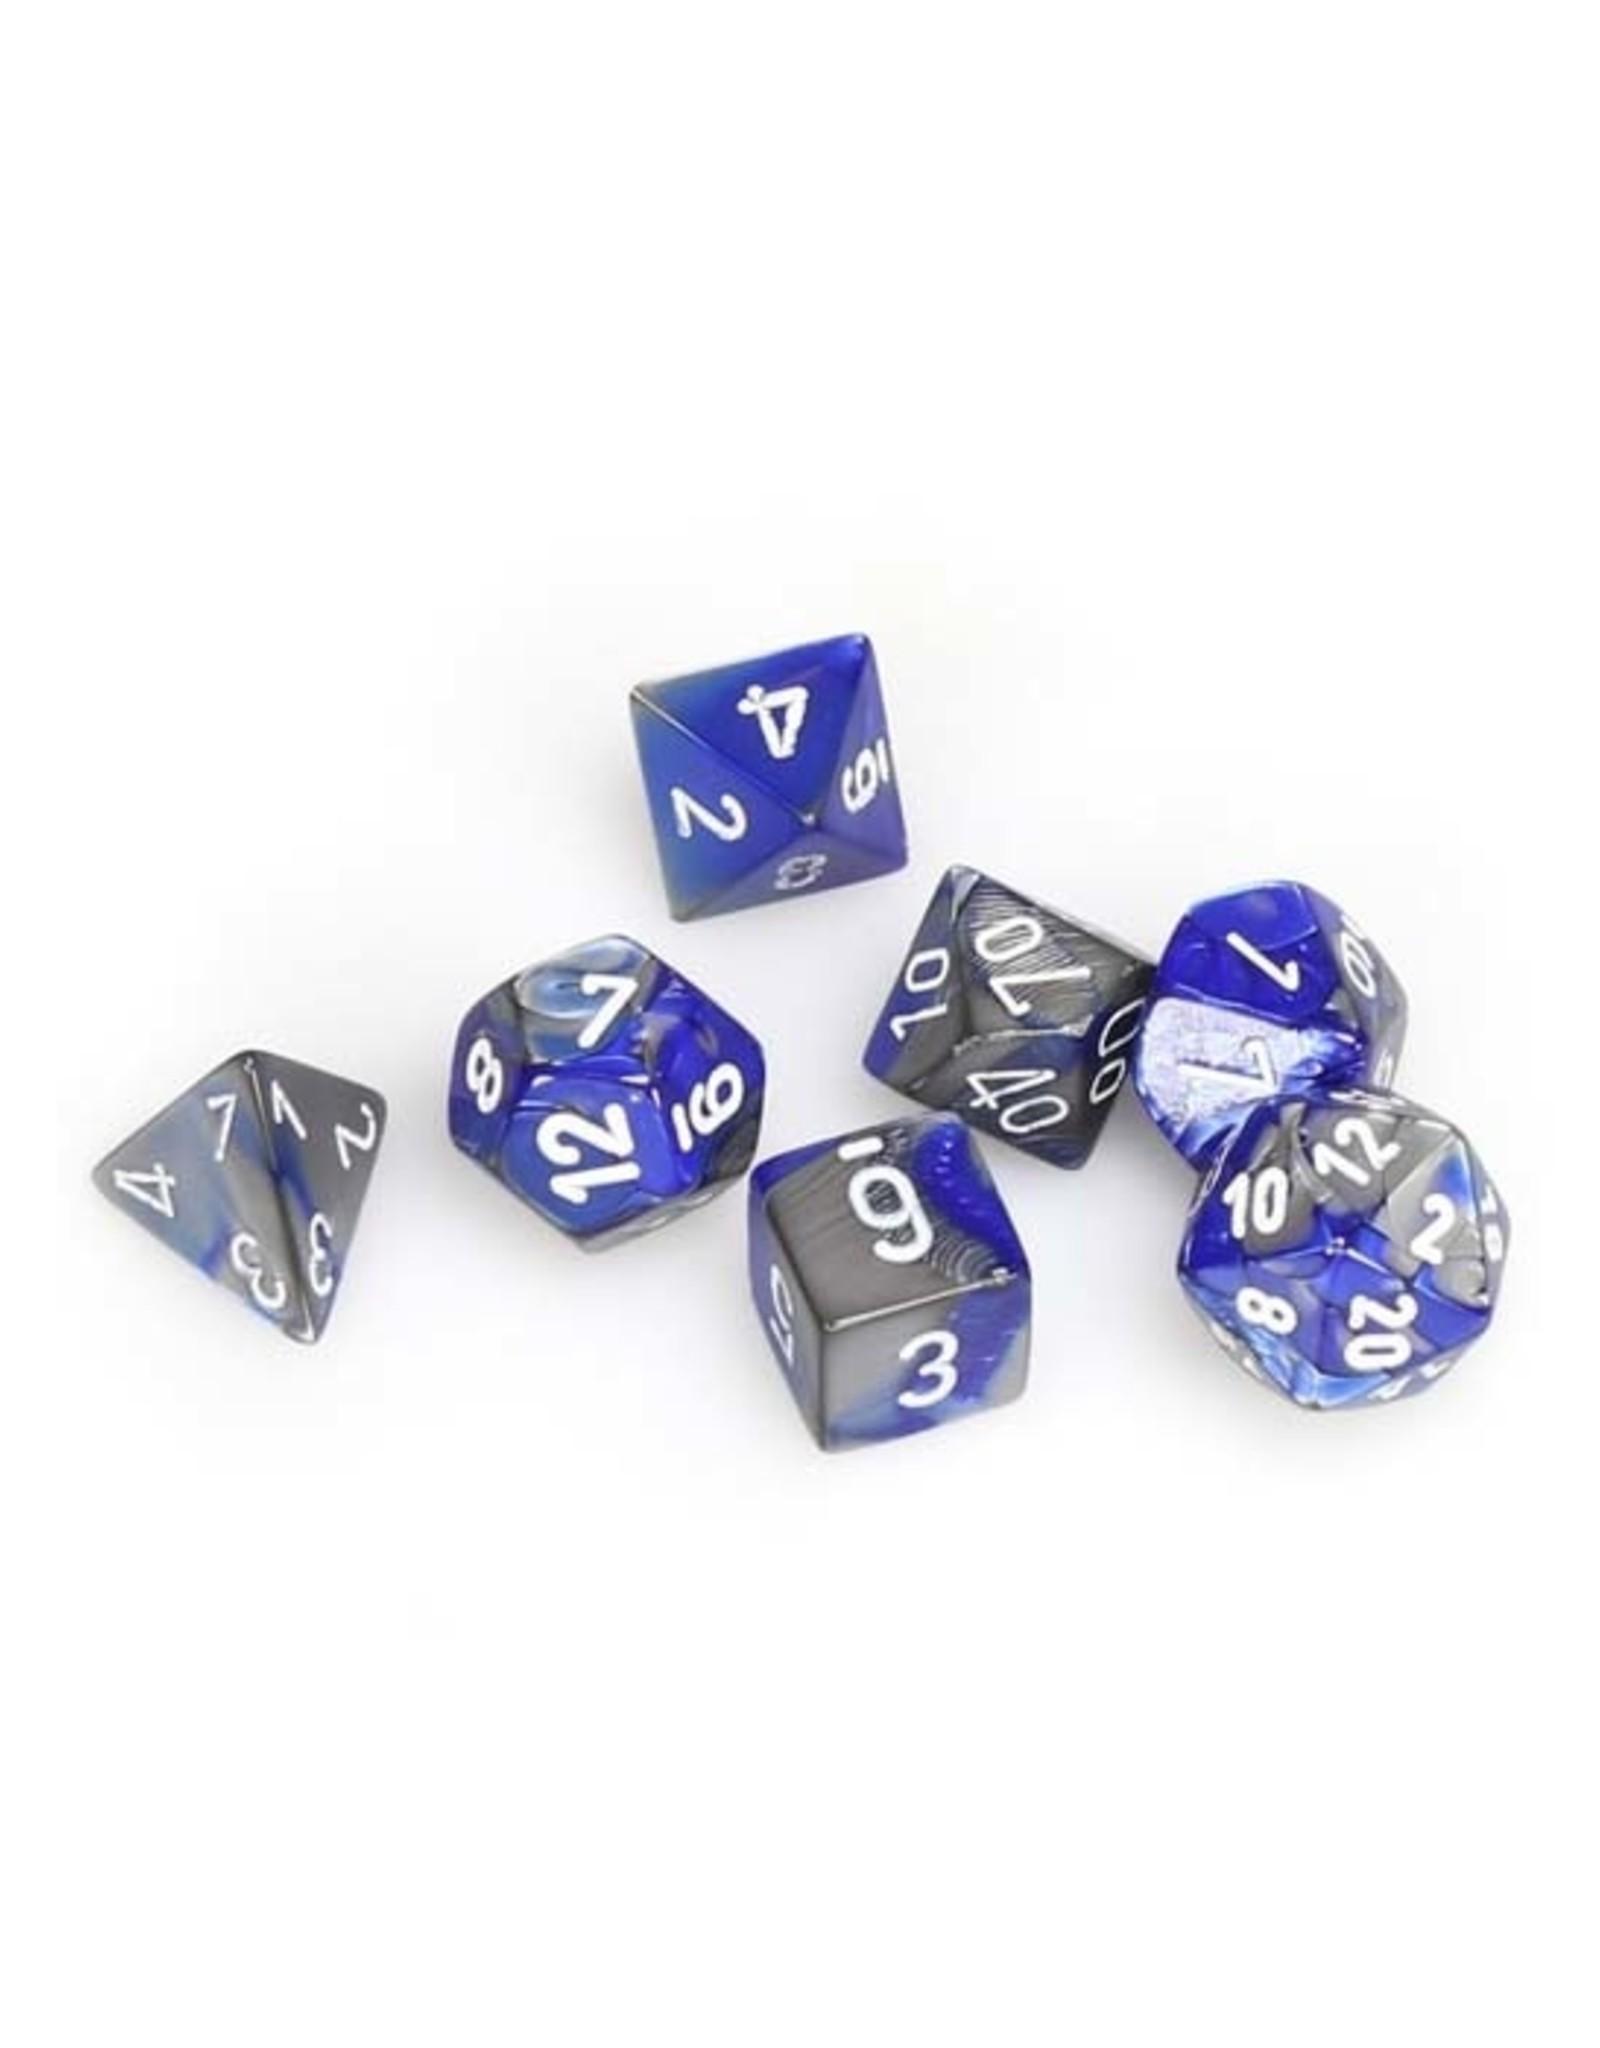 Chessex Chessex: Poly 7 Set - Gemini - Blue-Steel w/ White